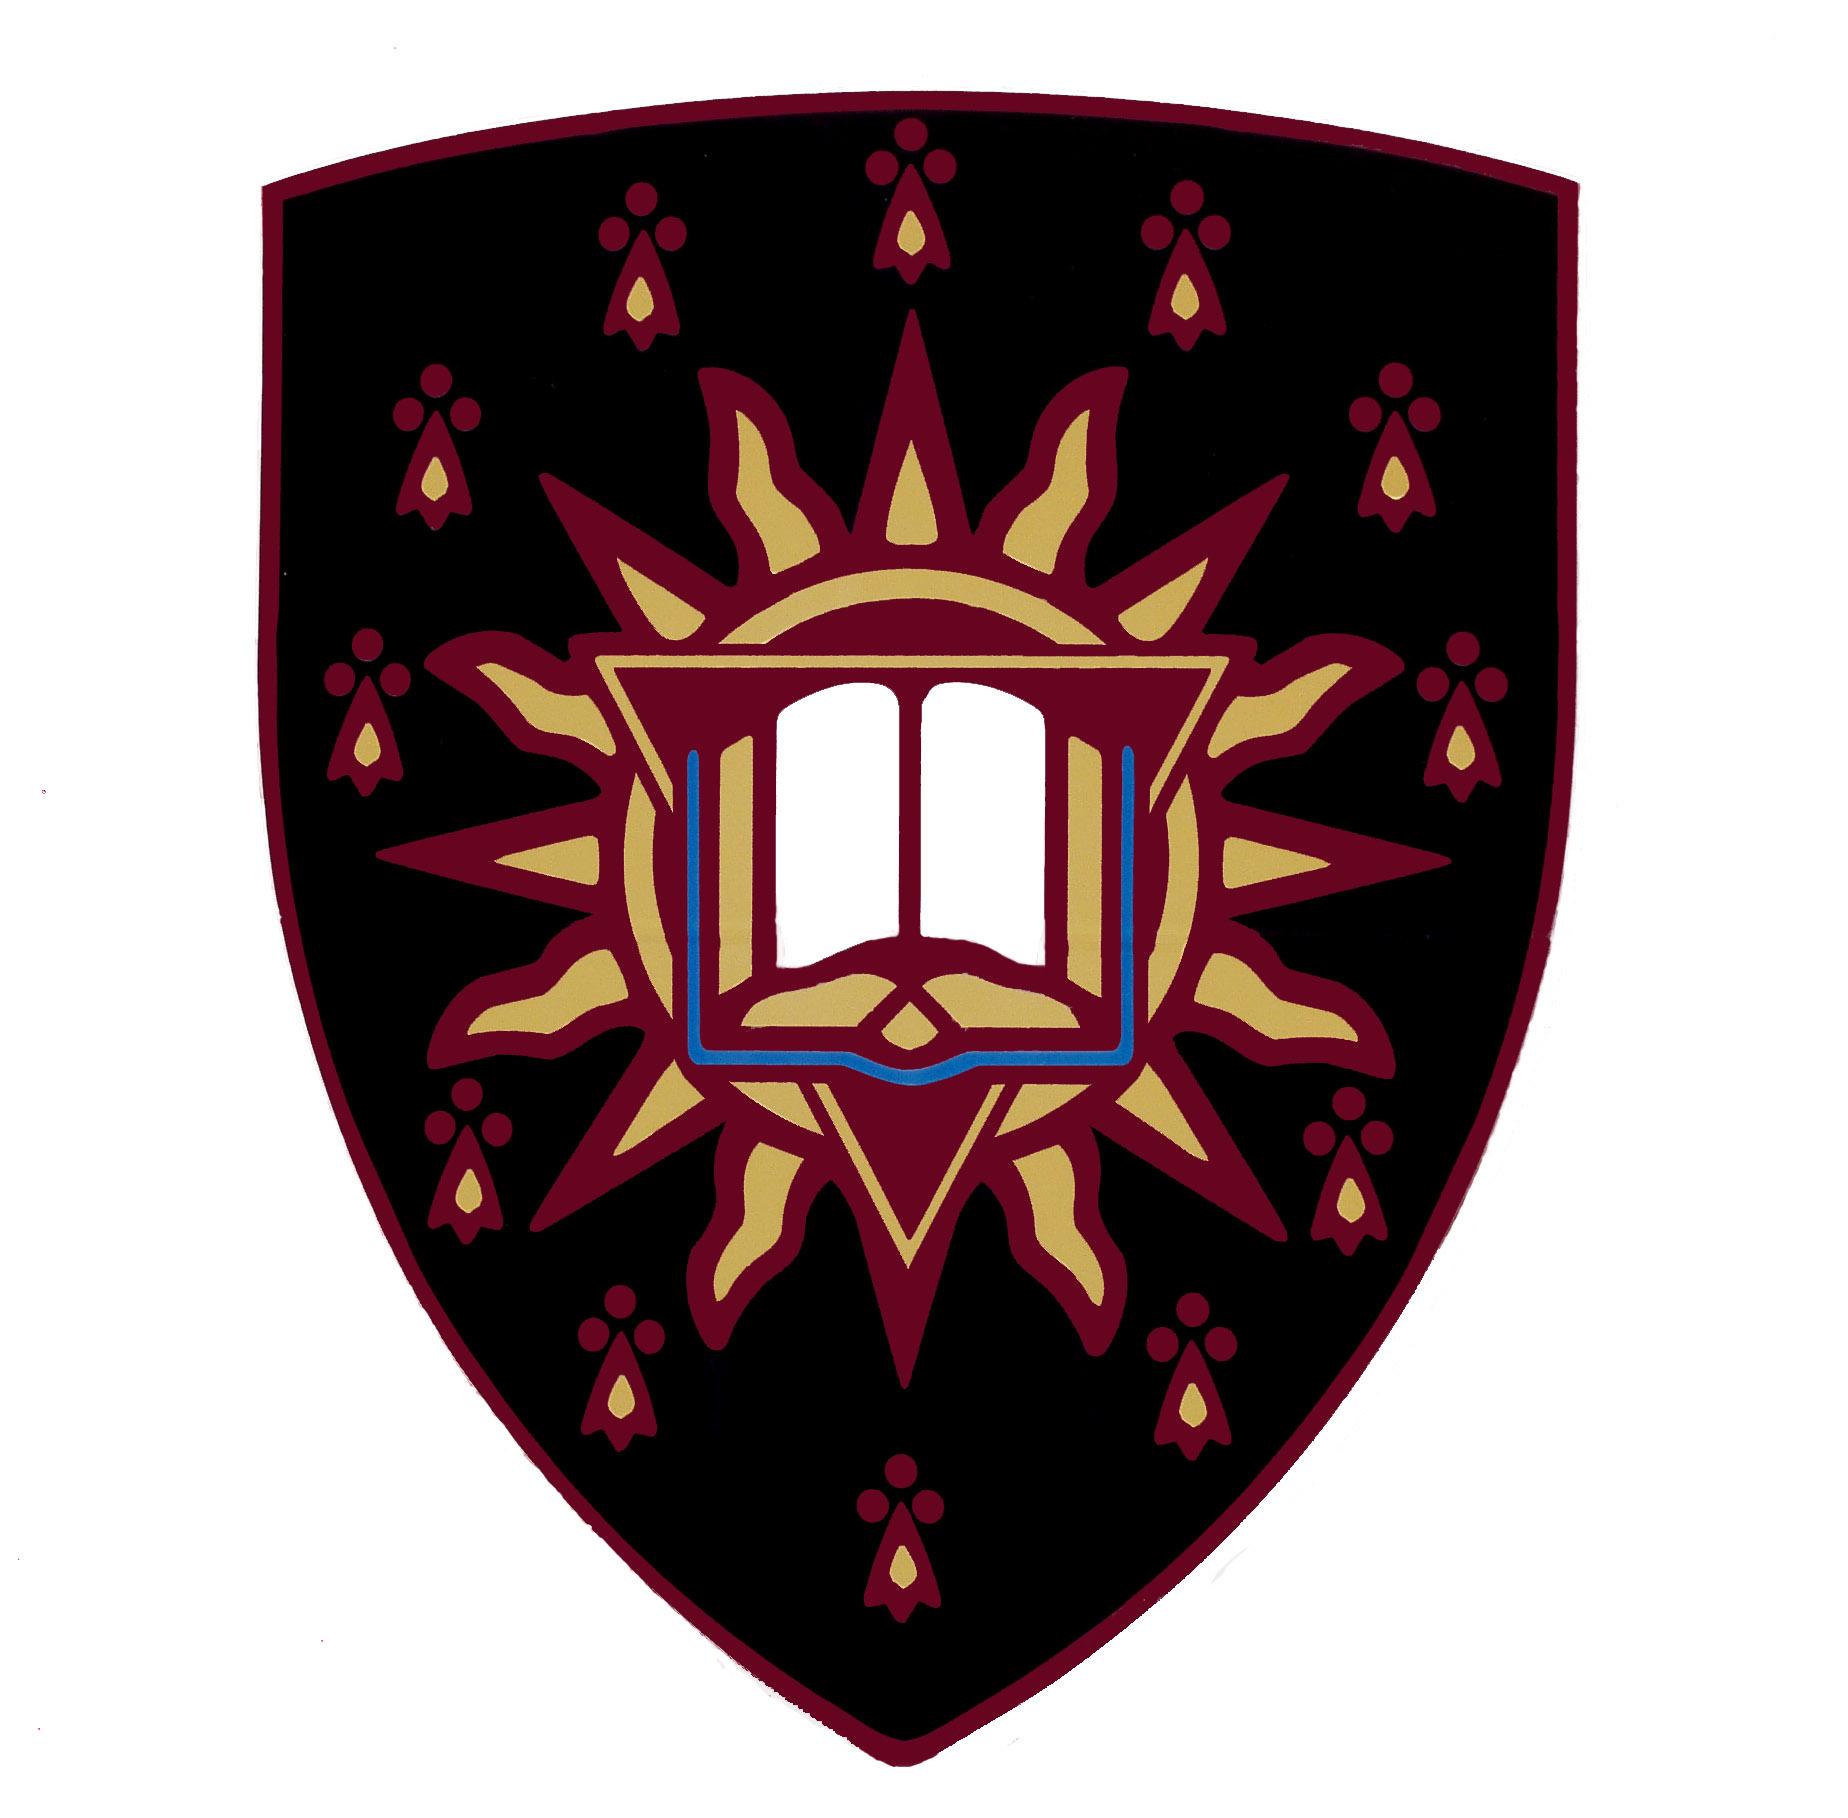 https://upload.wikimedia.org/wikipedia/commons/8/8b/Concordia_shield3.jpg